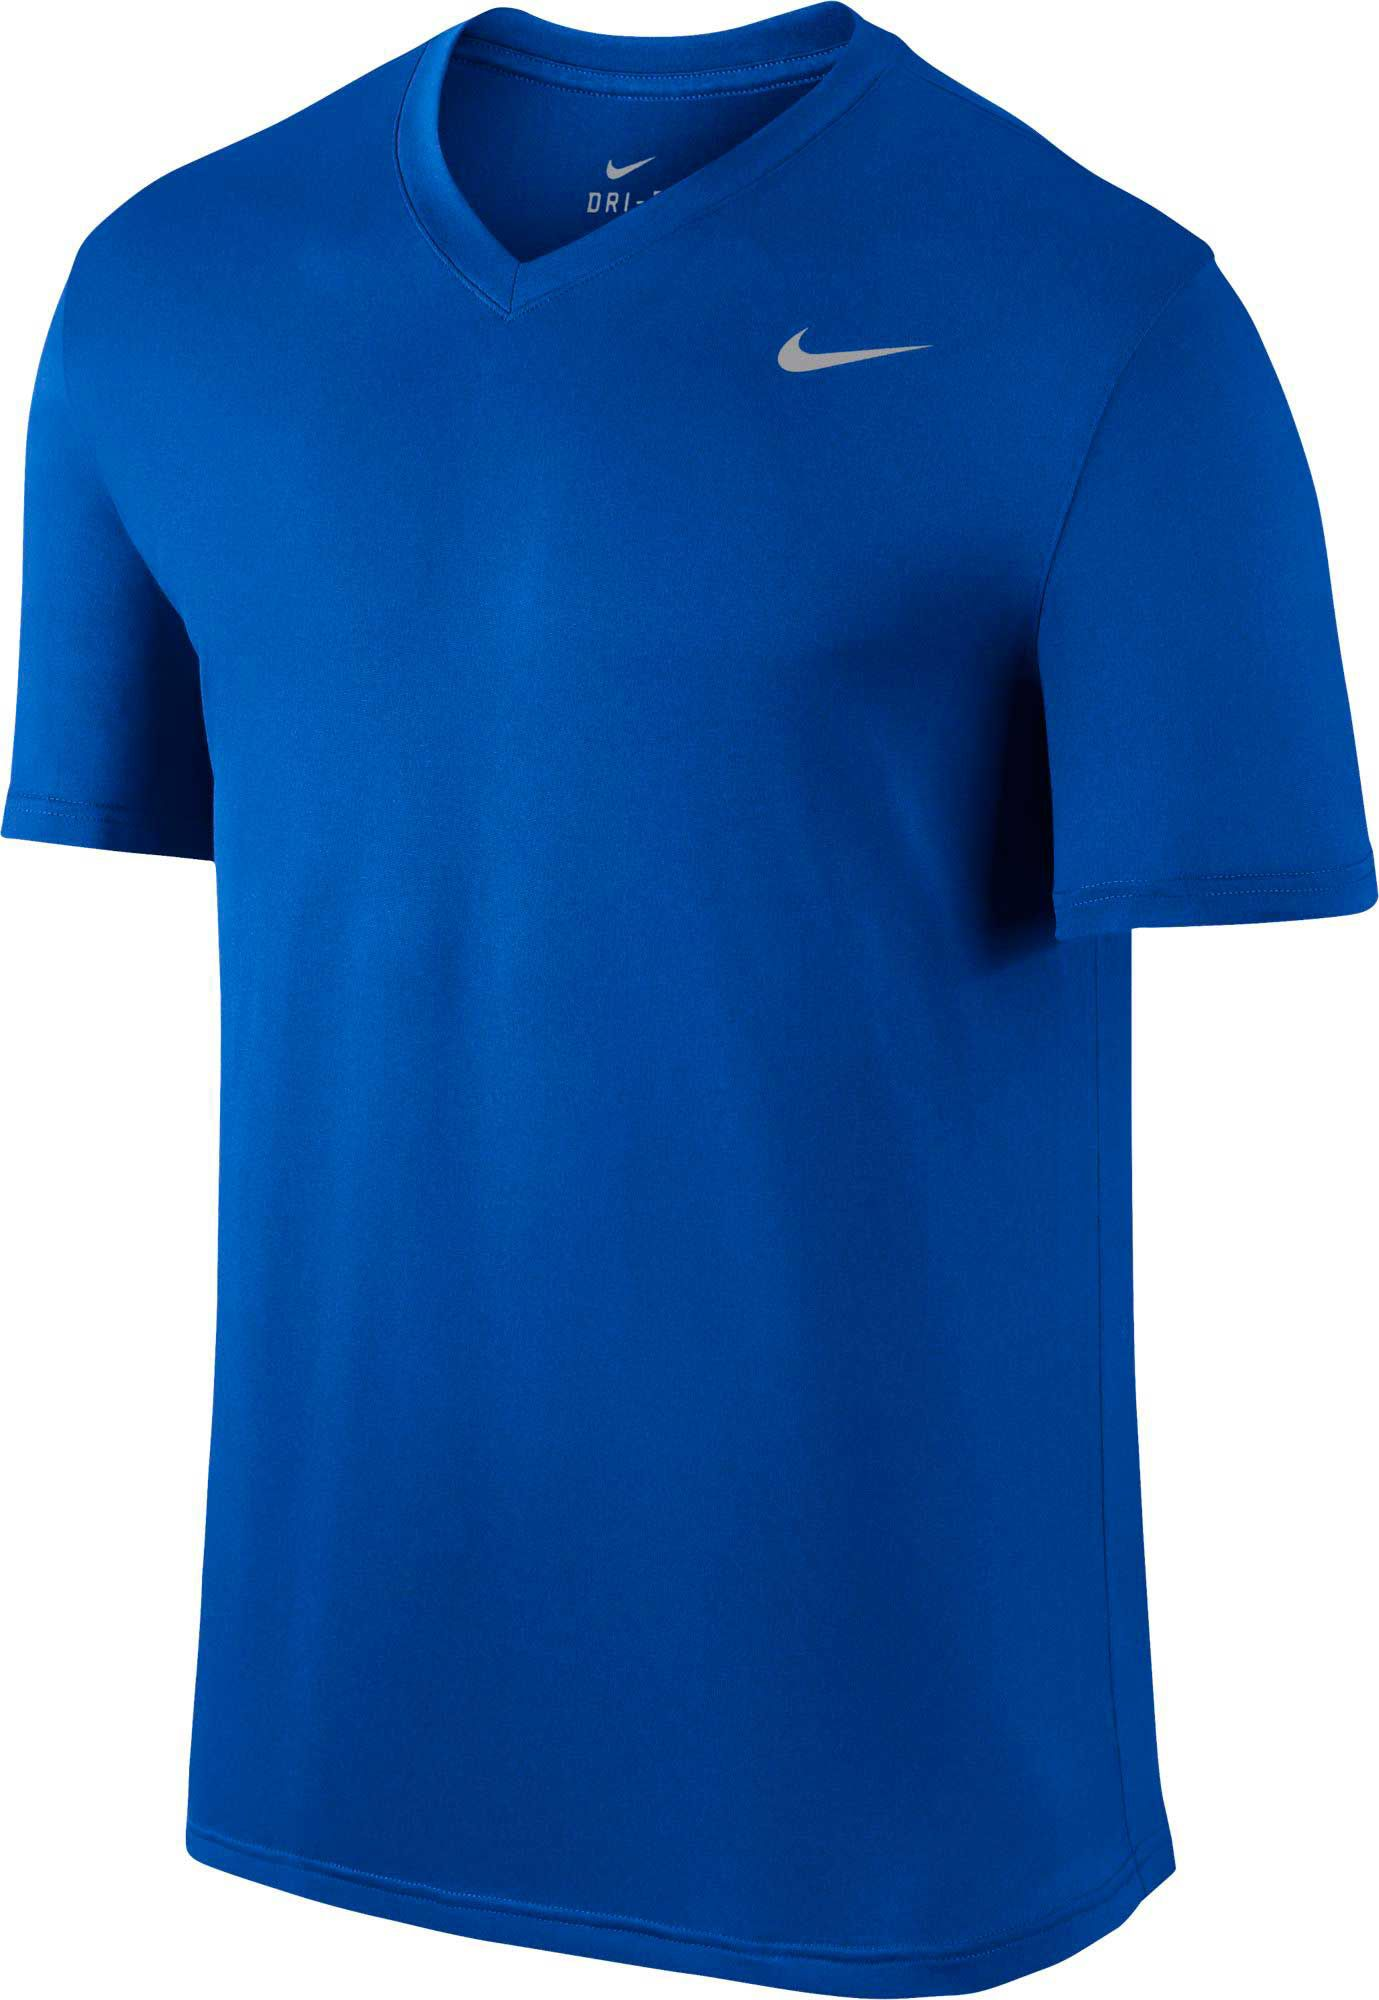 BETRUE 2016 - Nike News